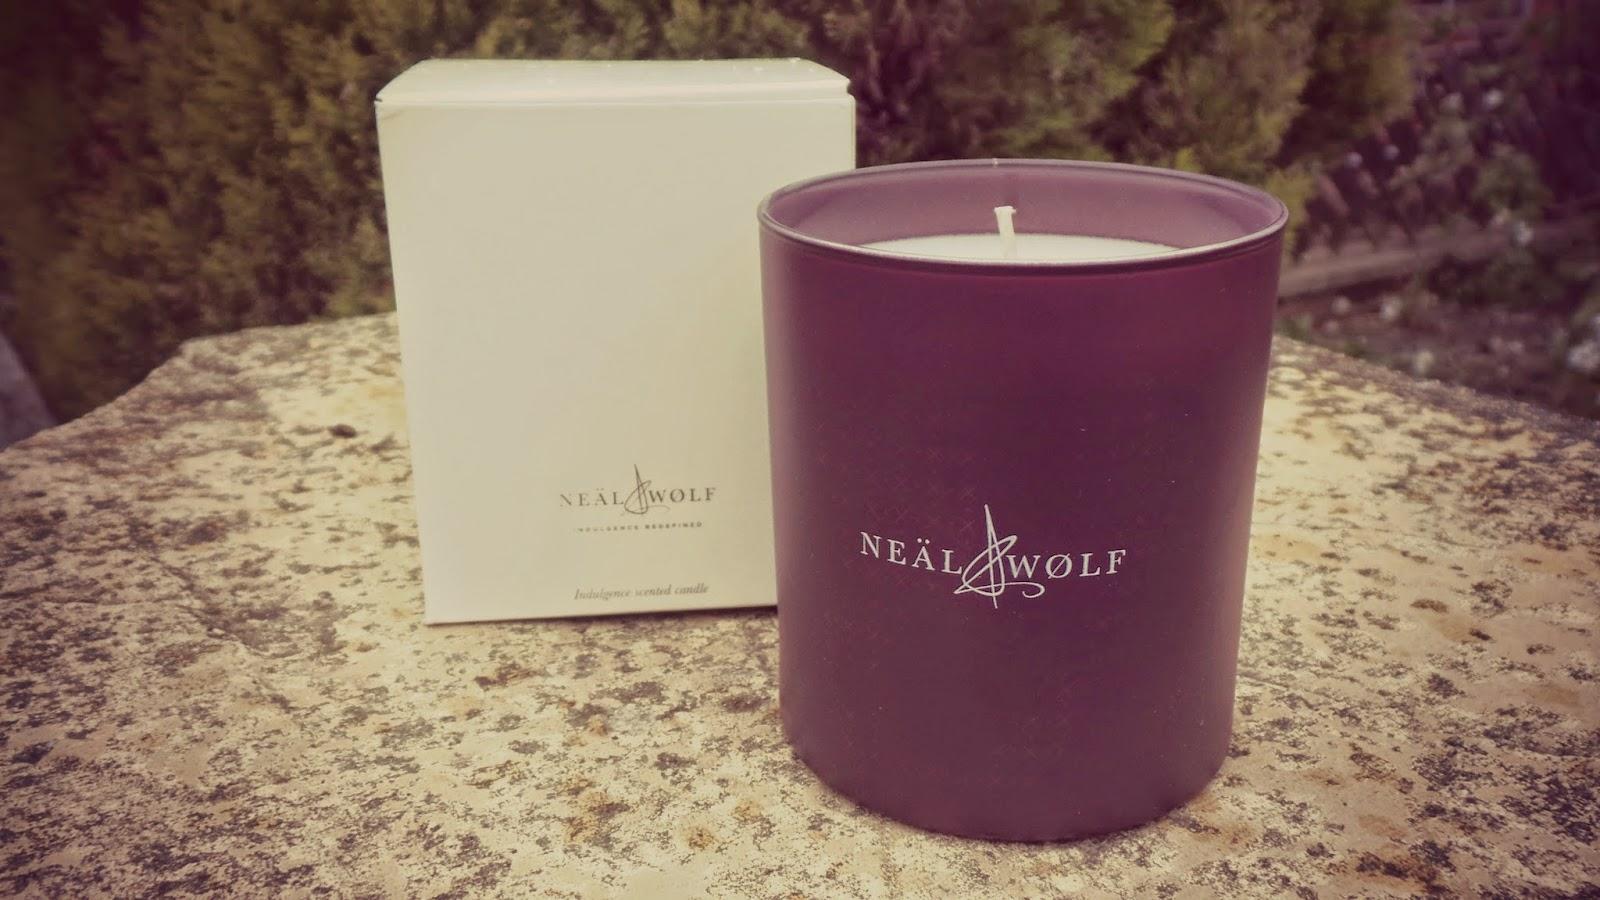 candle in purple glass jar